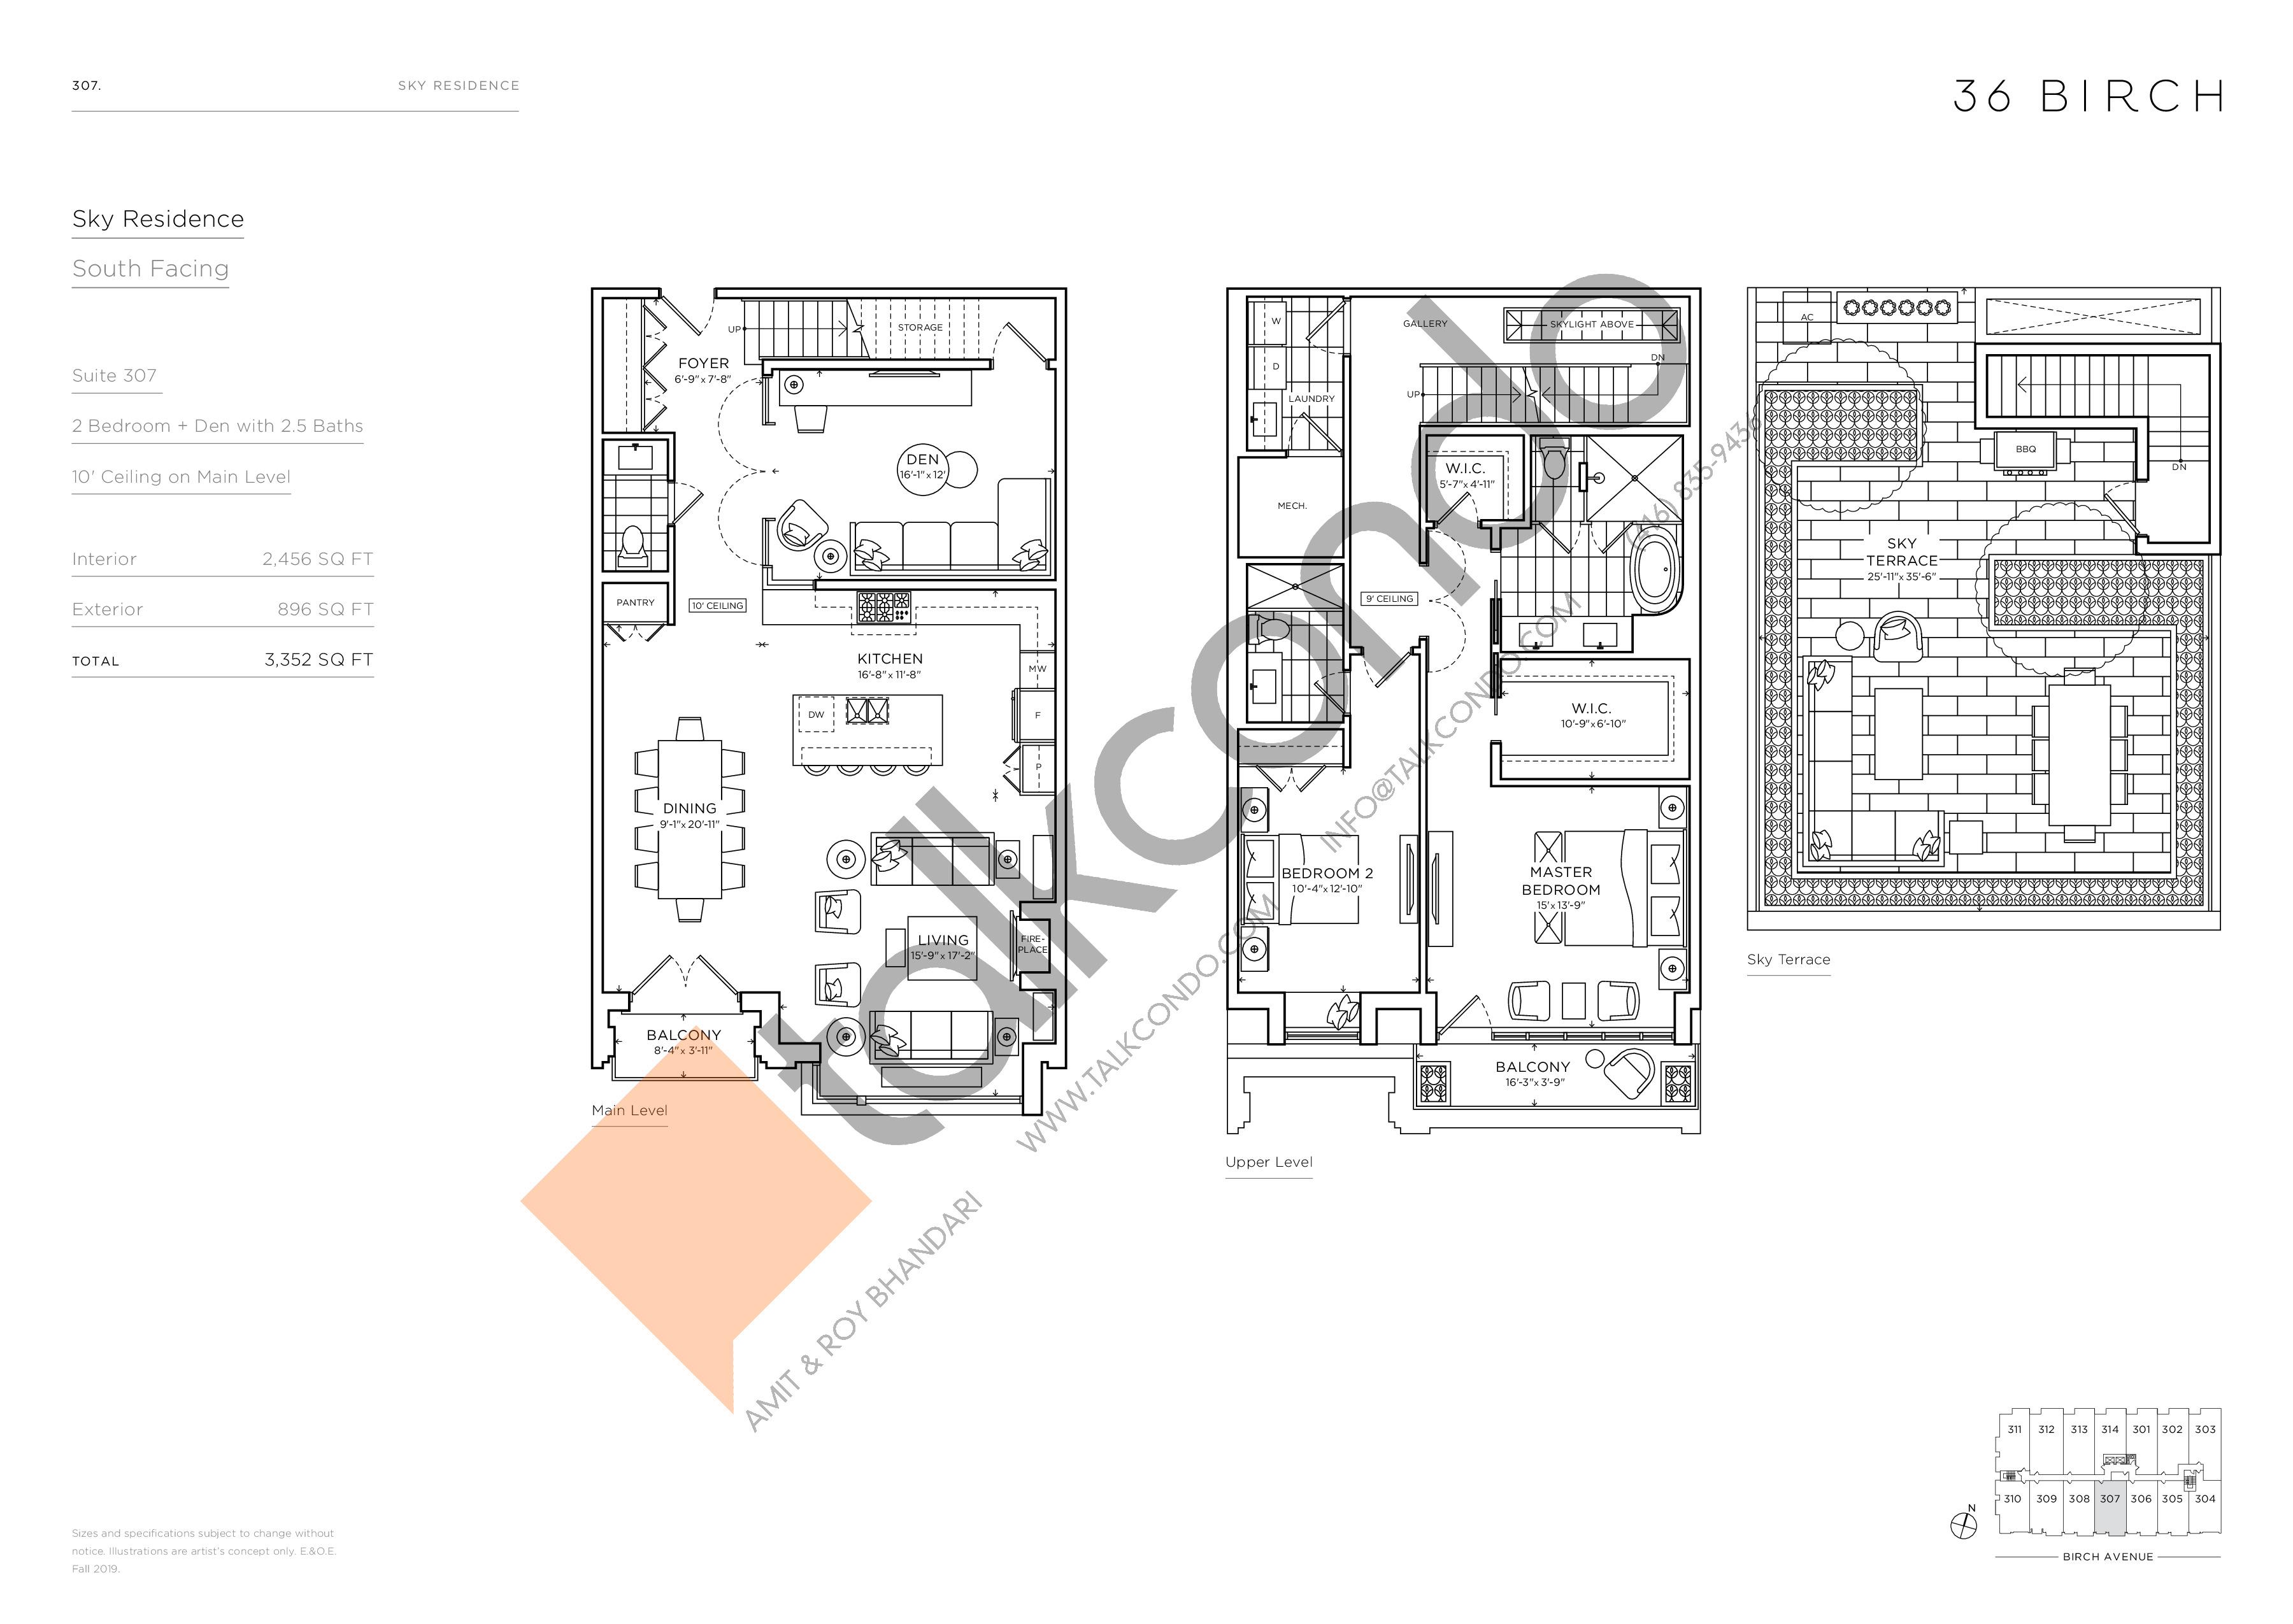 307 - Sky Residence Floor Plan at 36 Birch Condos - 2456 sq.ft